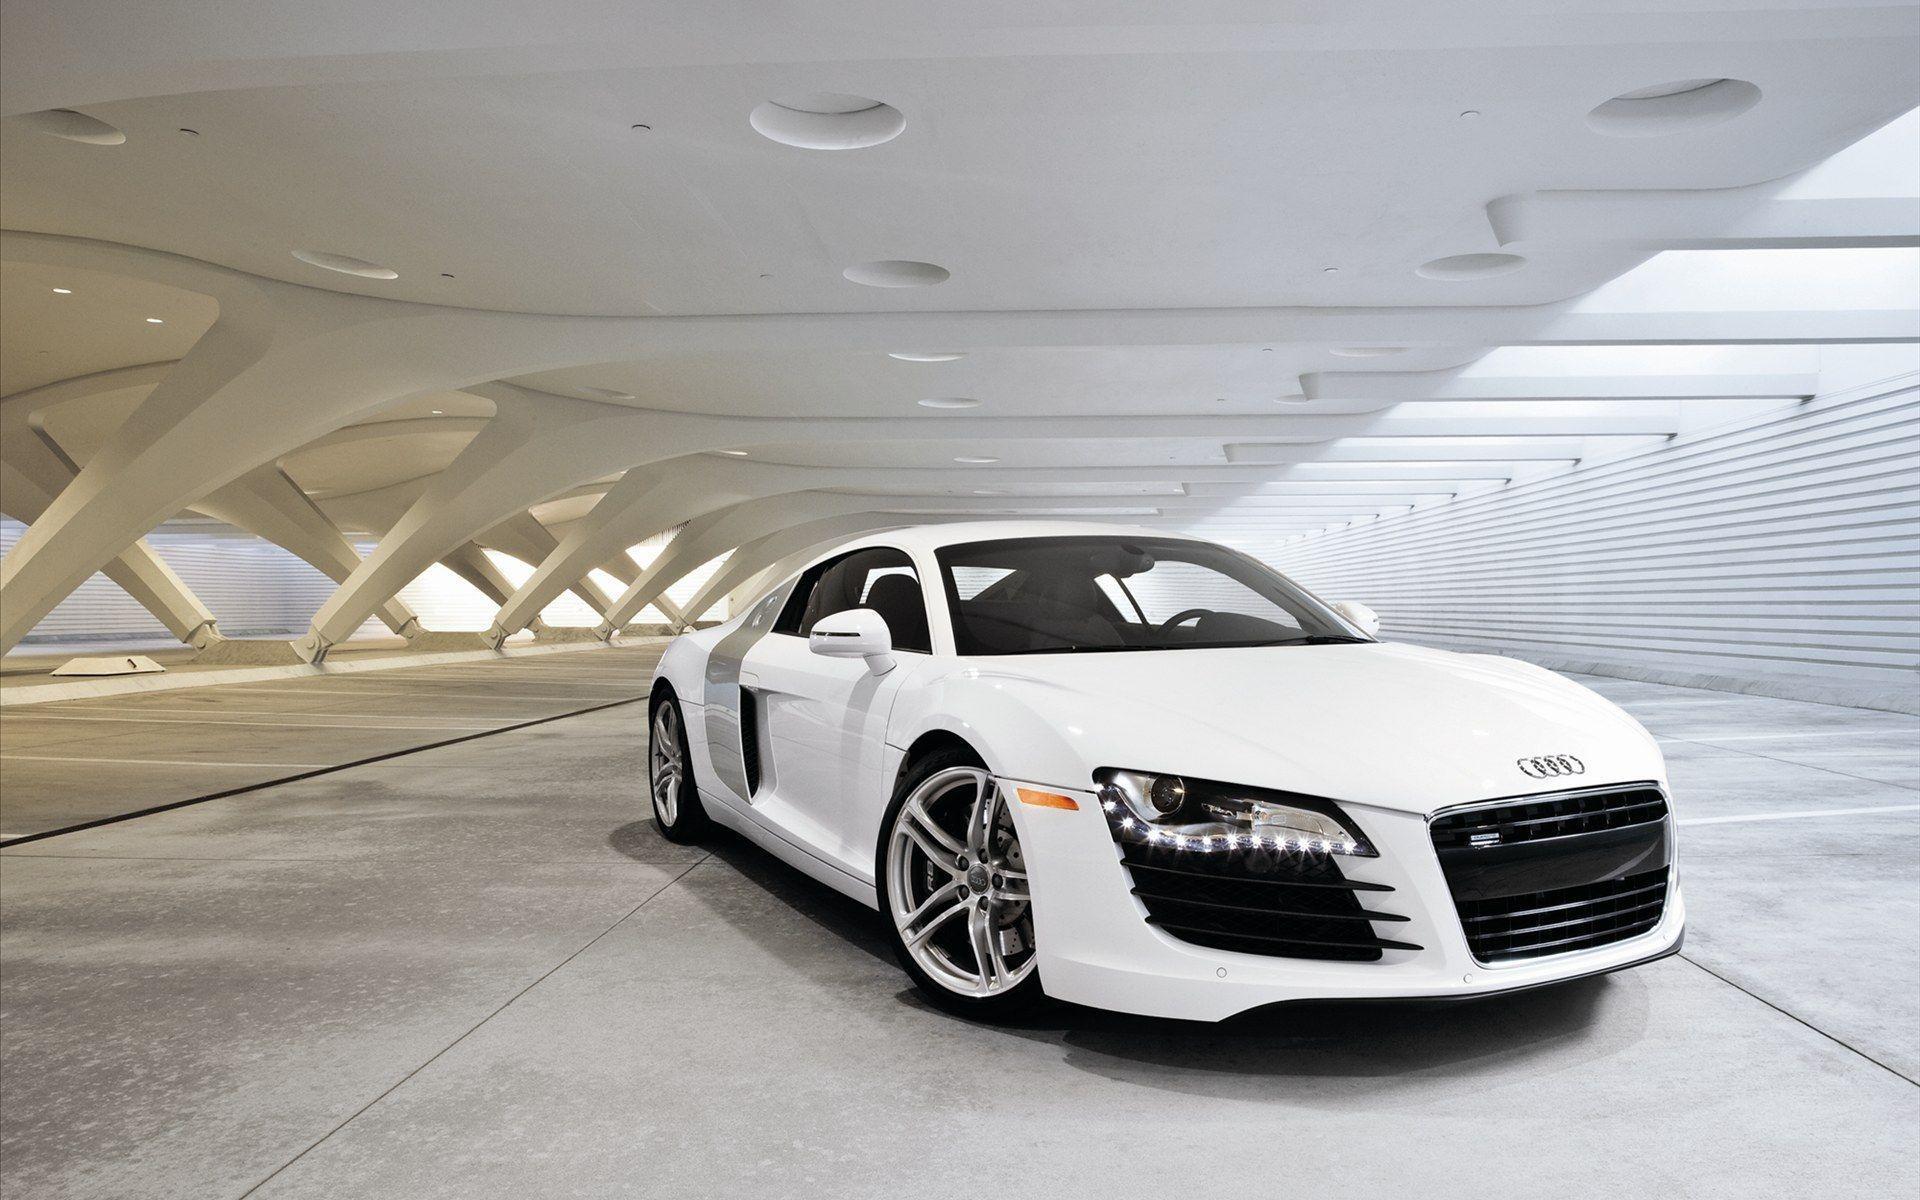 45 Best Free Audi D7 Ultra Hd Wallpapers Wallpaperaccess